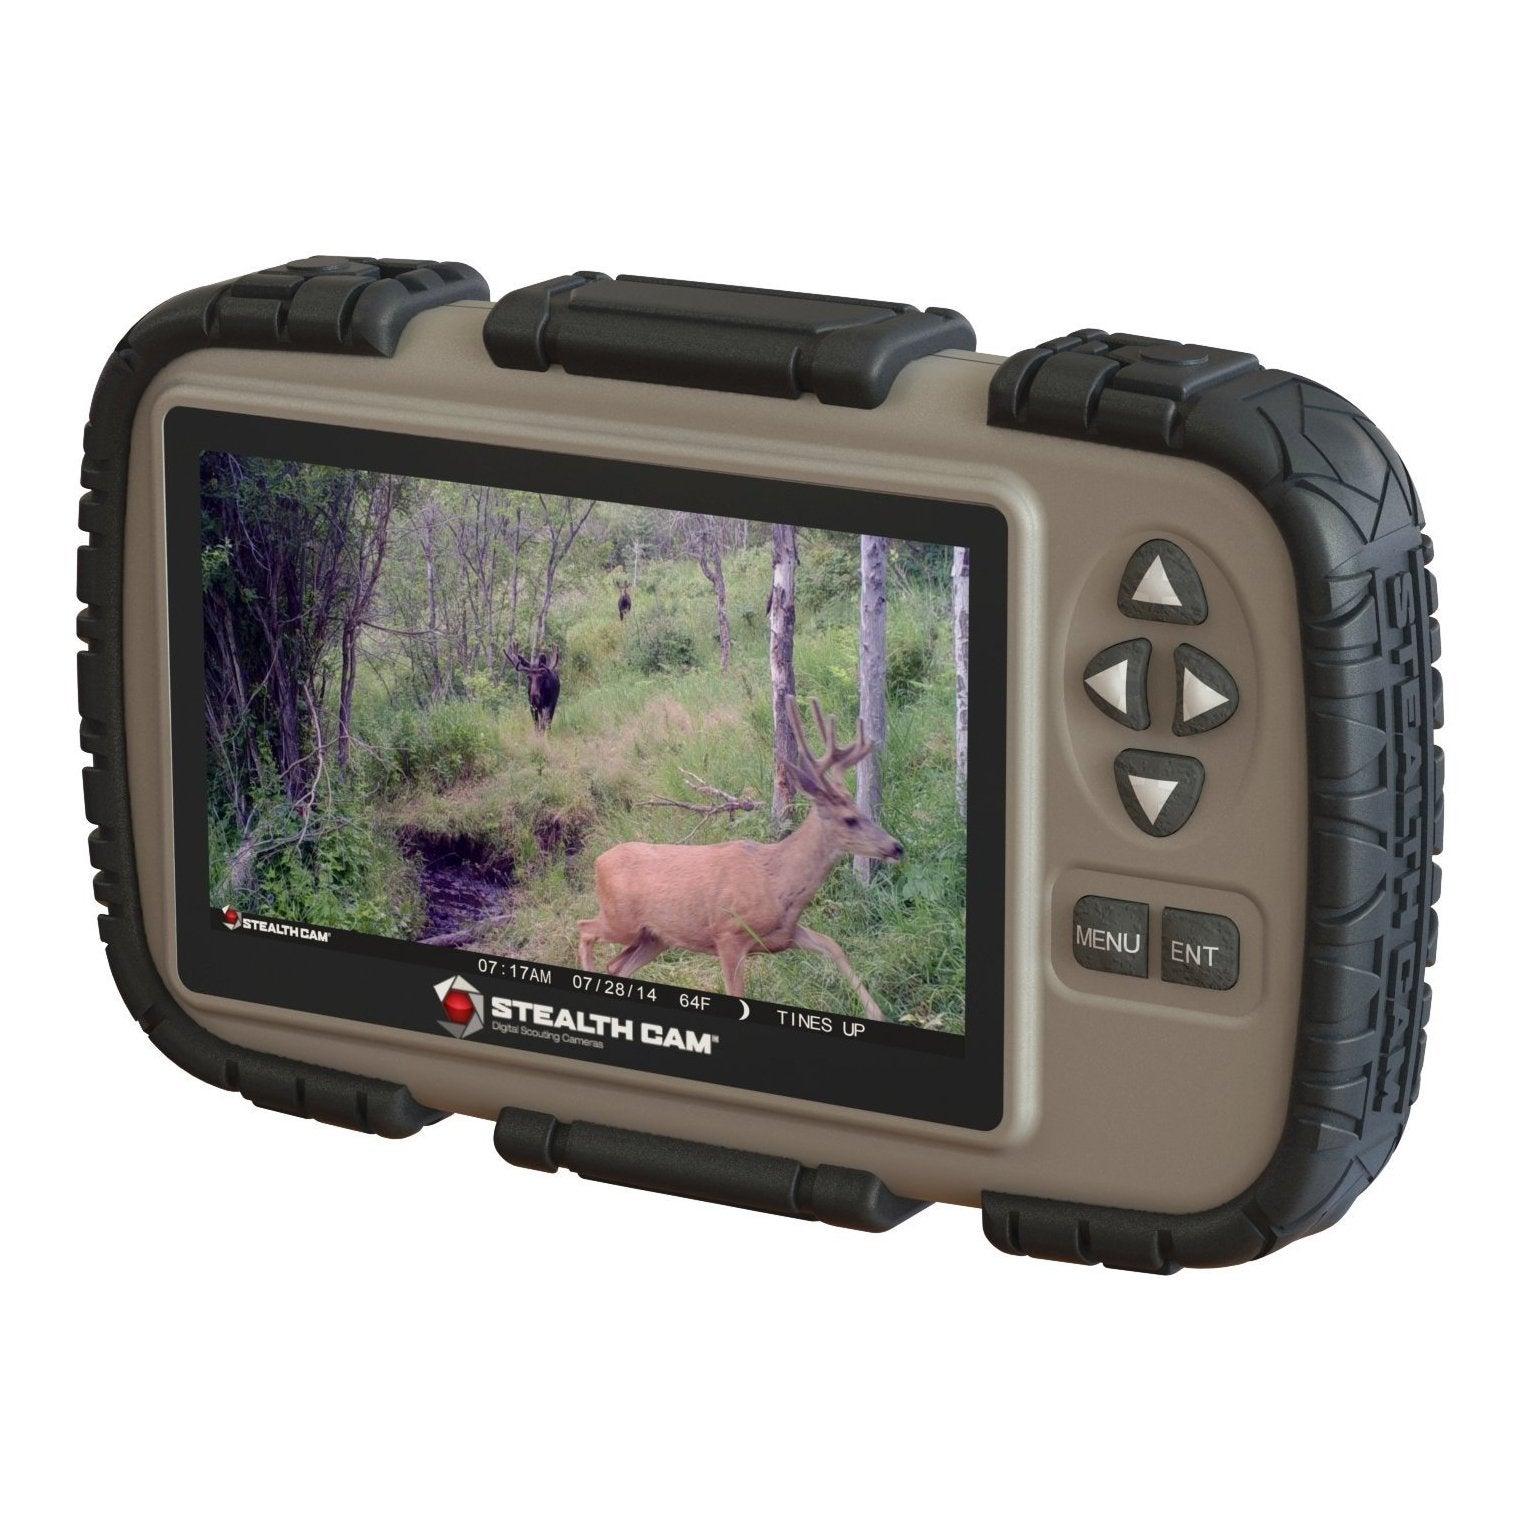 Stealth Cam portable card reader